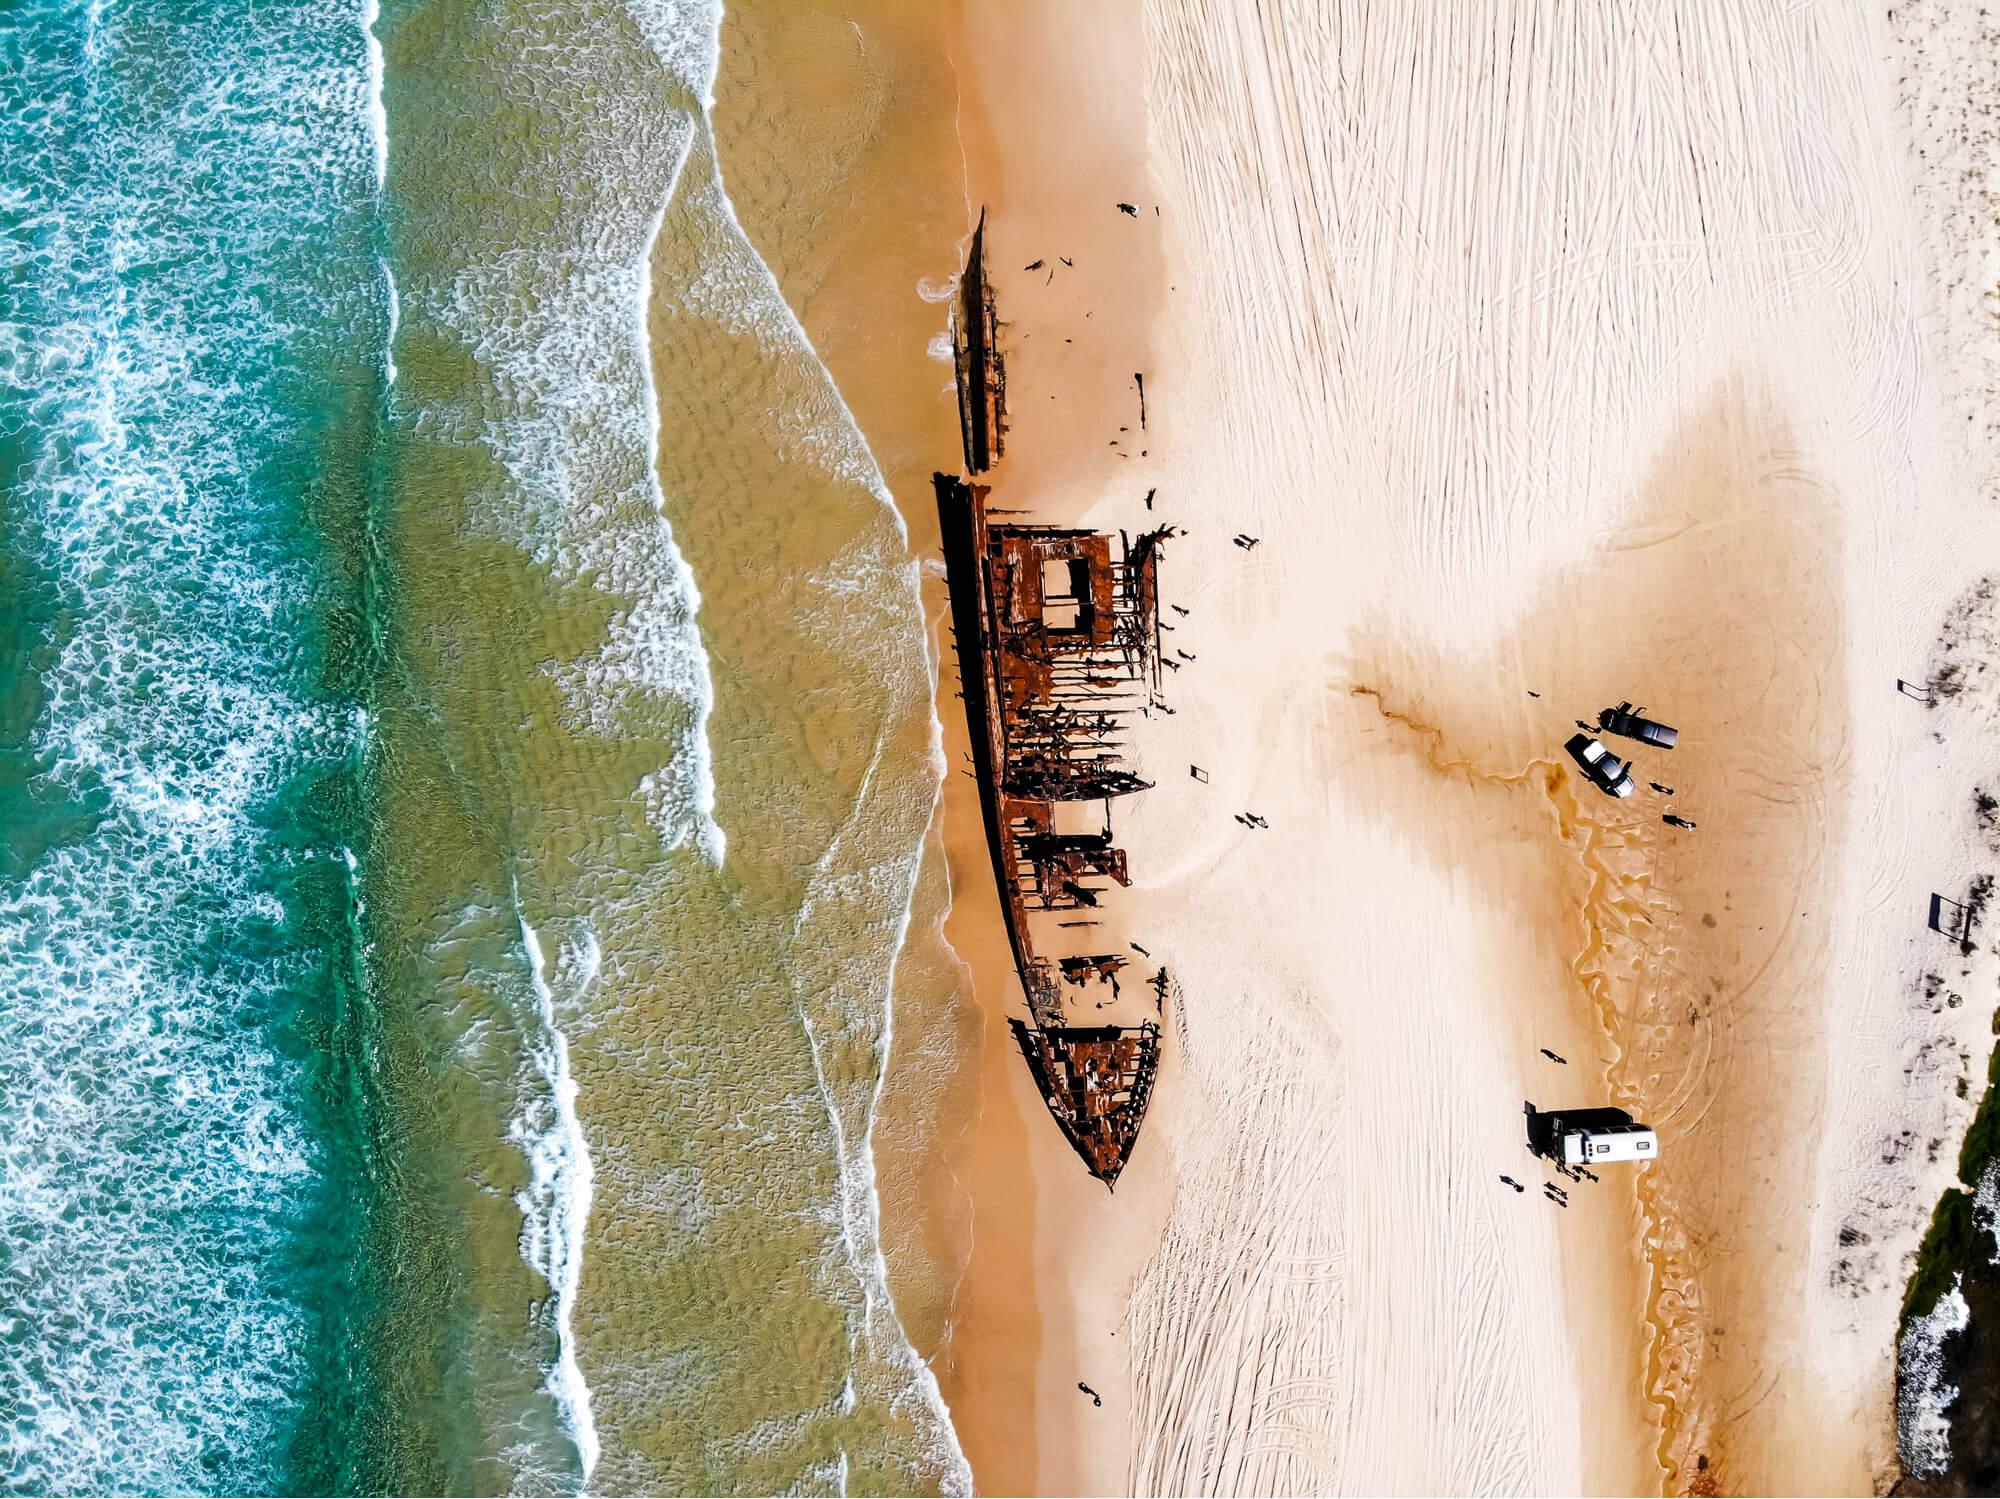 SS Maheno shipwreck on Fraser Island - a popular tourist destination in Australia